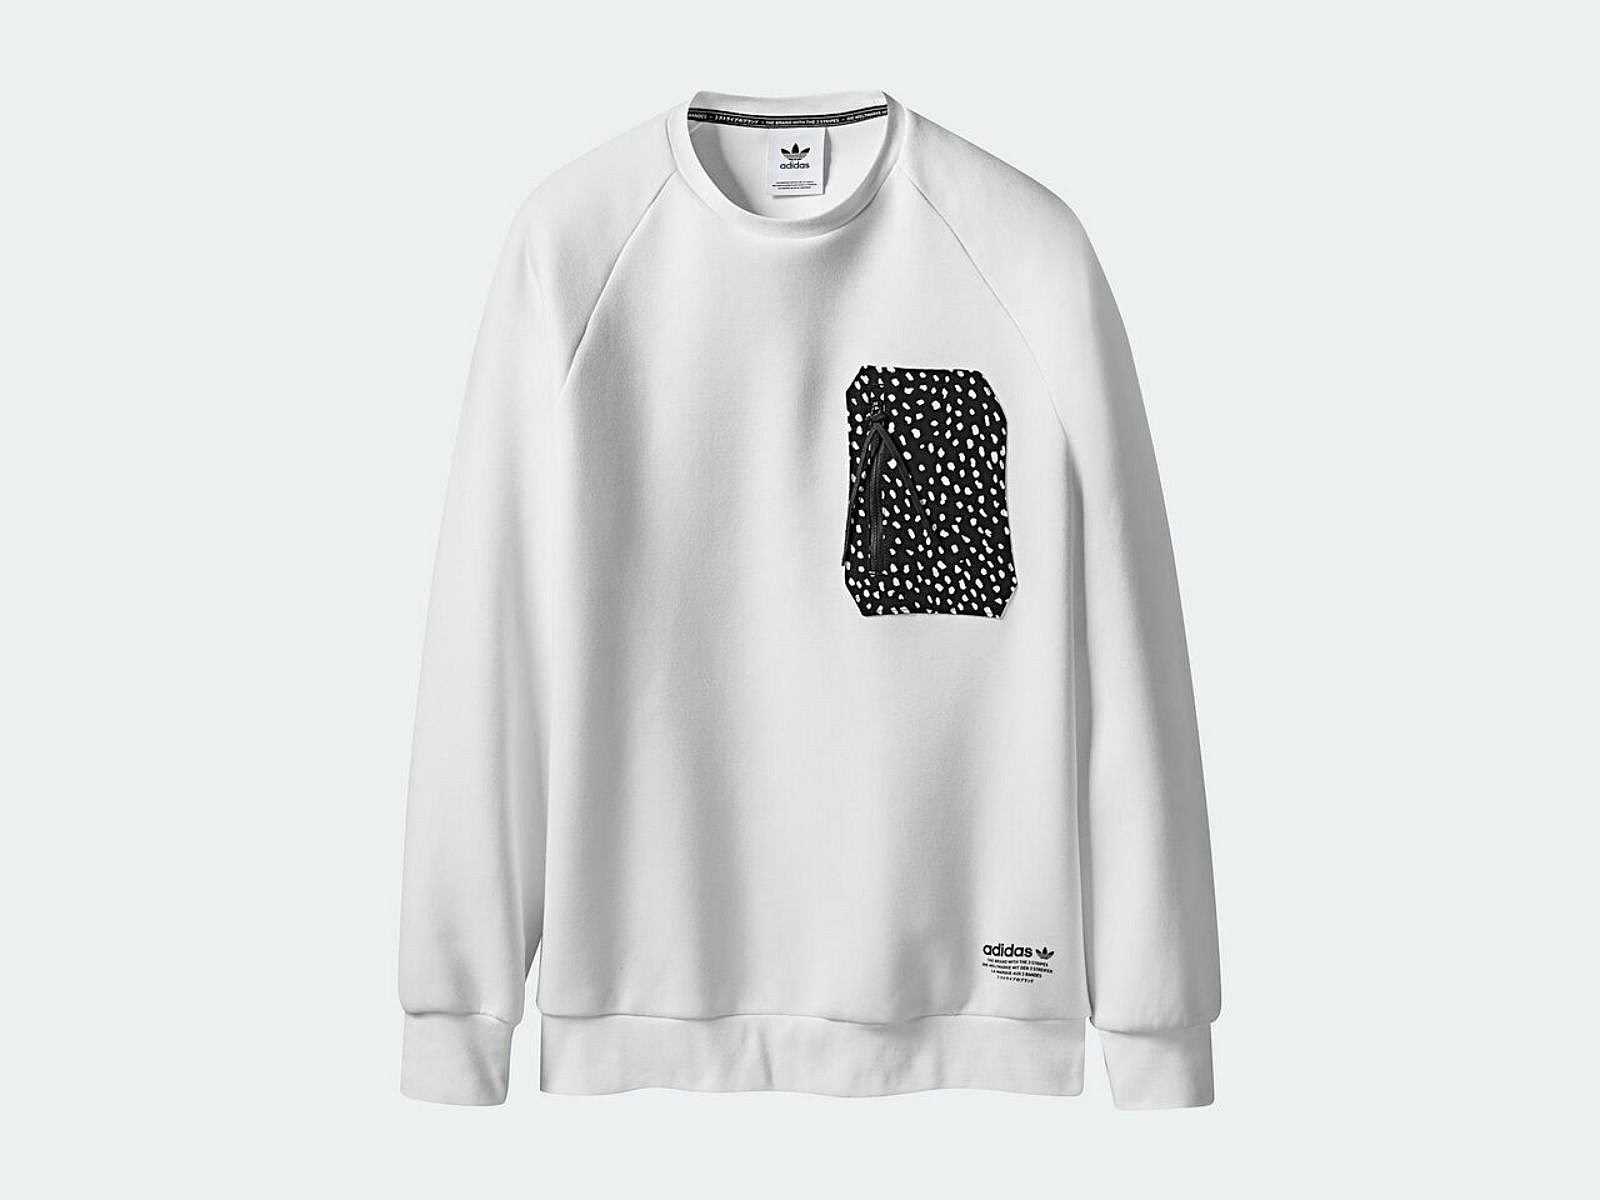 monclersalebuy - Dominasi Musim Dingin Dengan Koleksi Fall & Winter 2017 Adidas